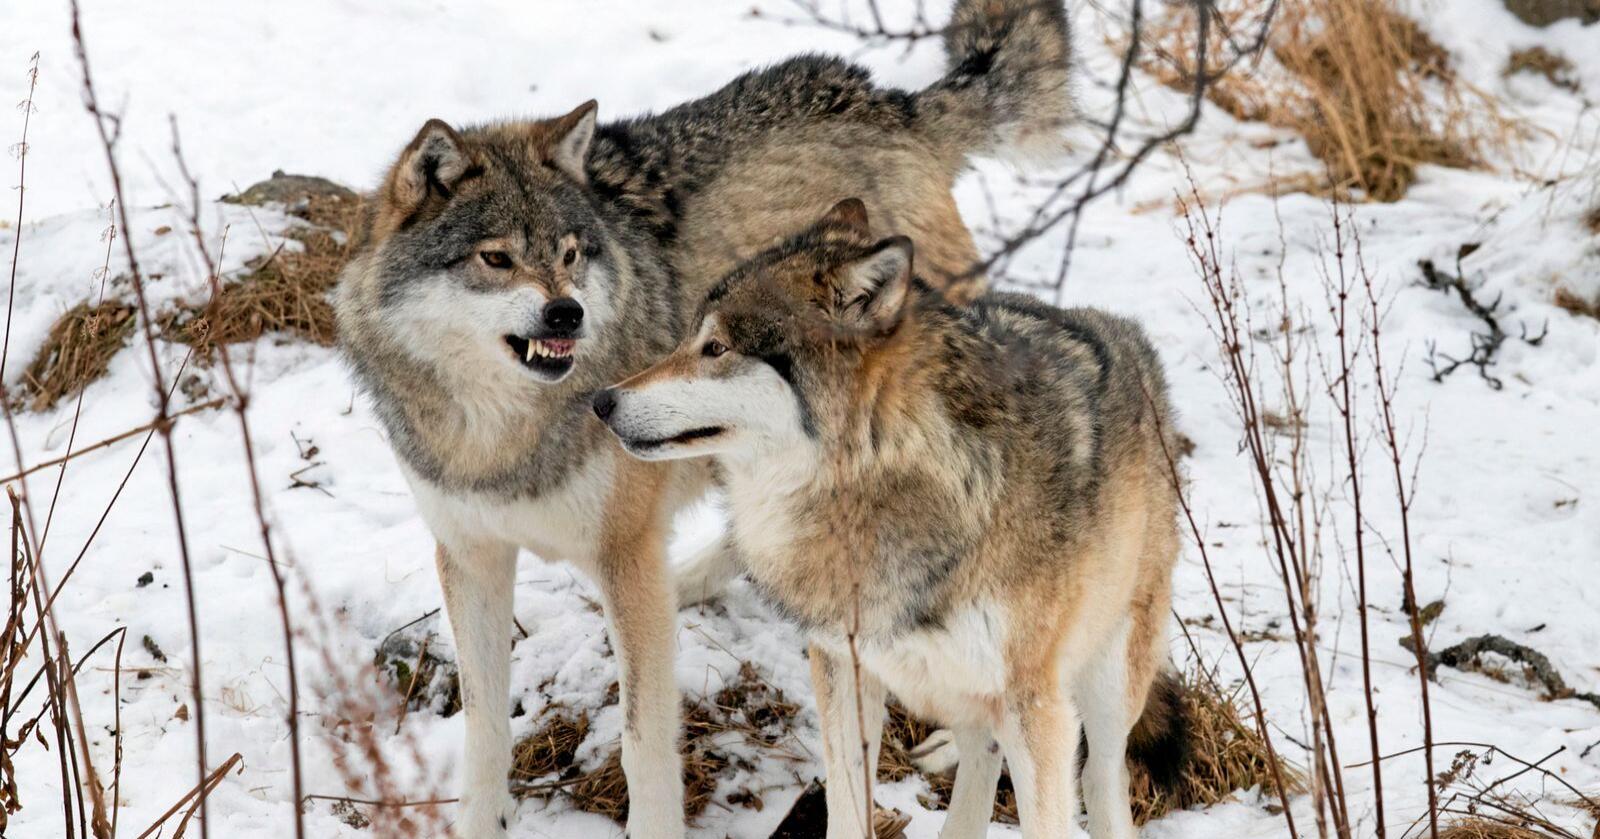 Regjeringen ønsker at rovviltklagenemnda blant annet skal få behandle klager på jaktkvoter på ulv. Foto: Heiko Junge / NTB scanpix